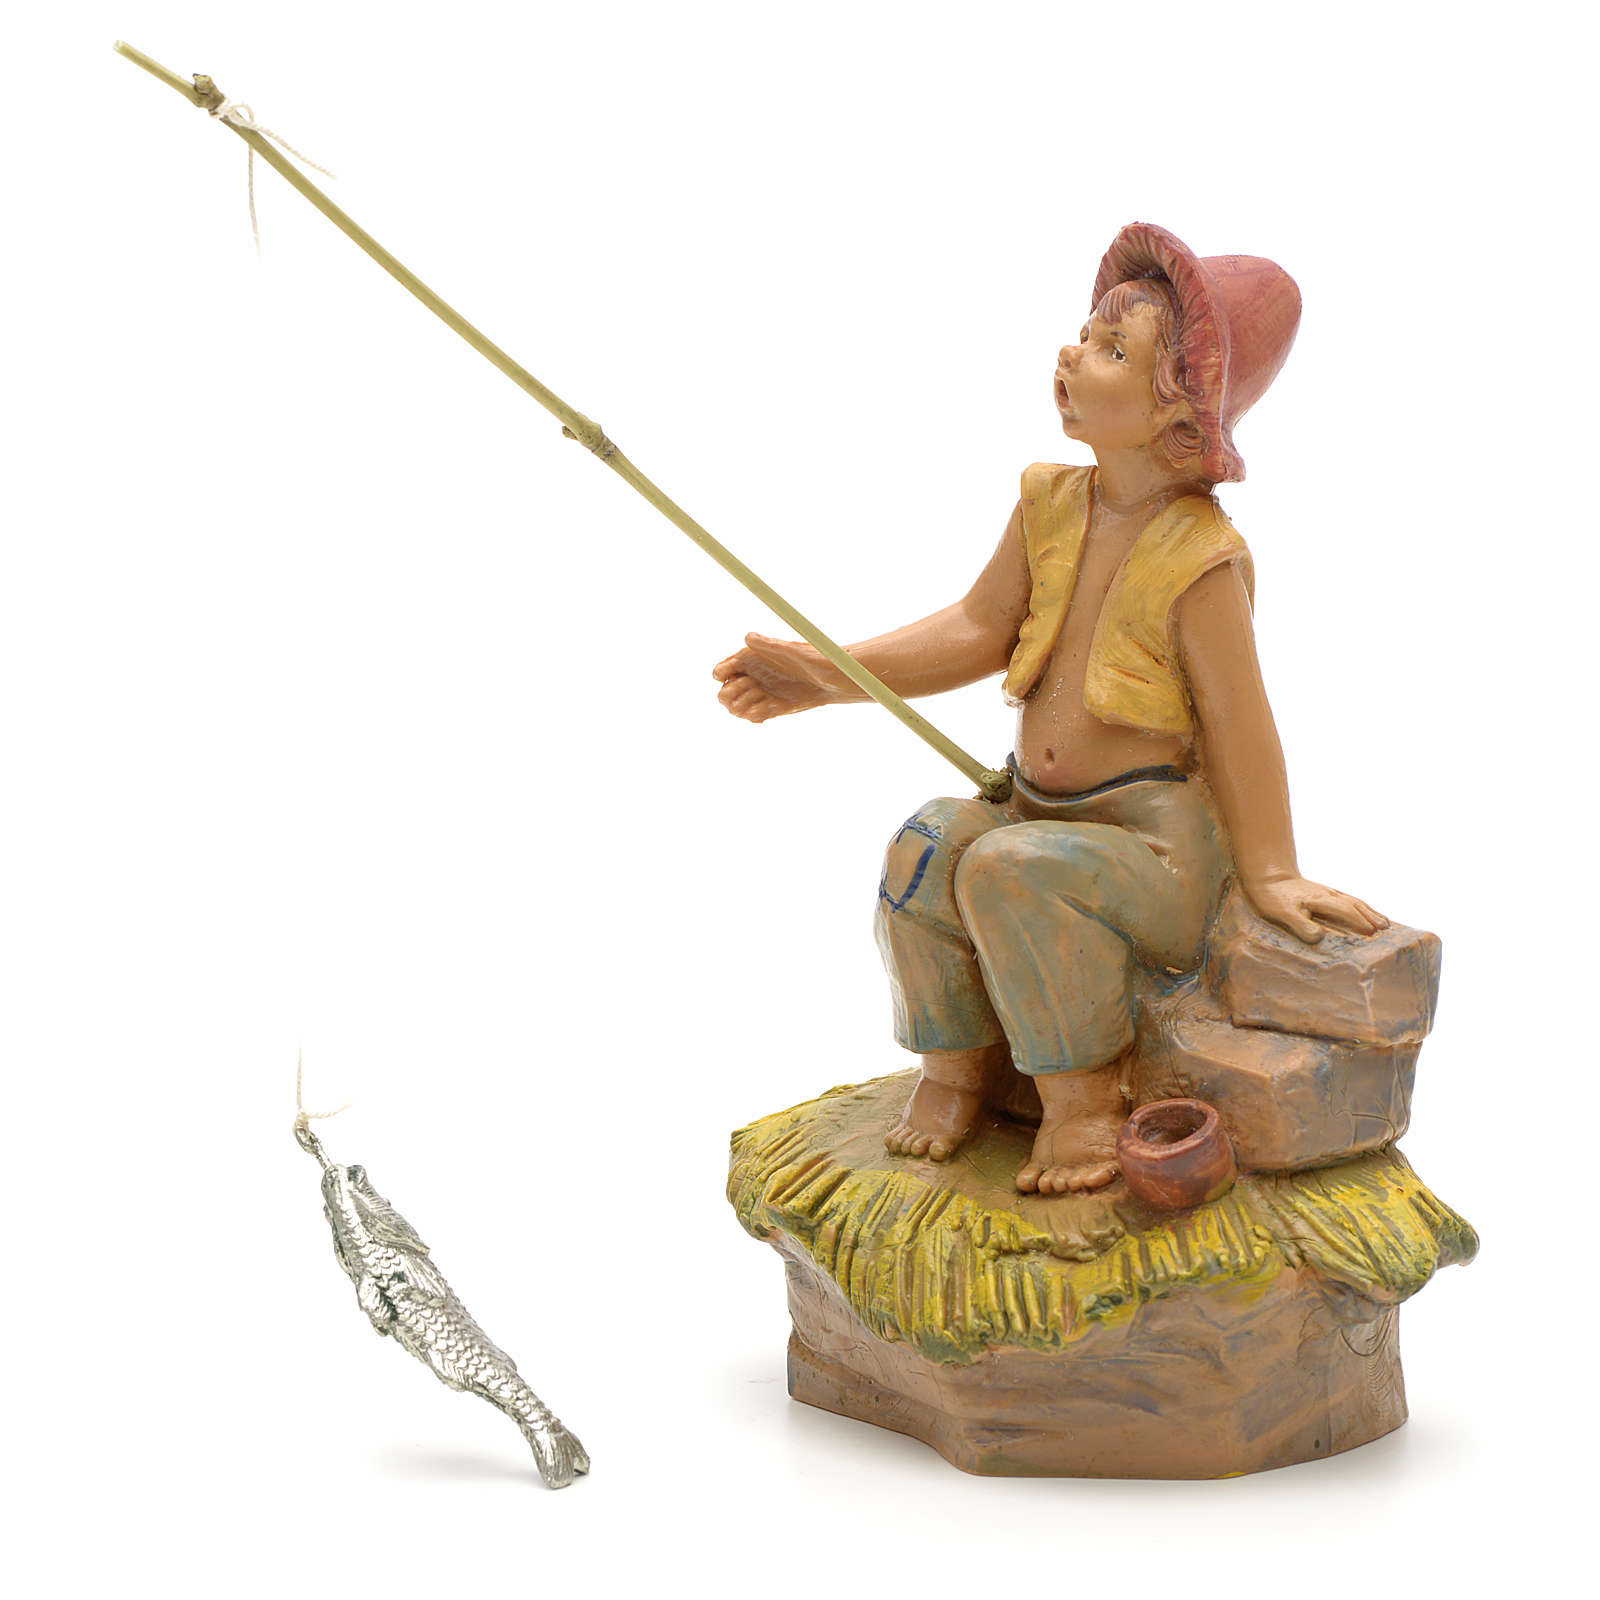 Chico pescador 12 cm Fontanini 3